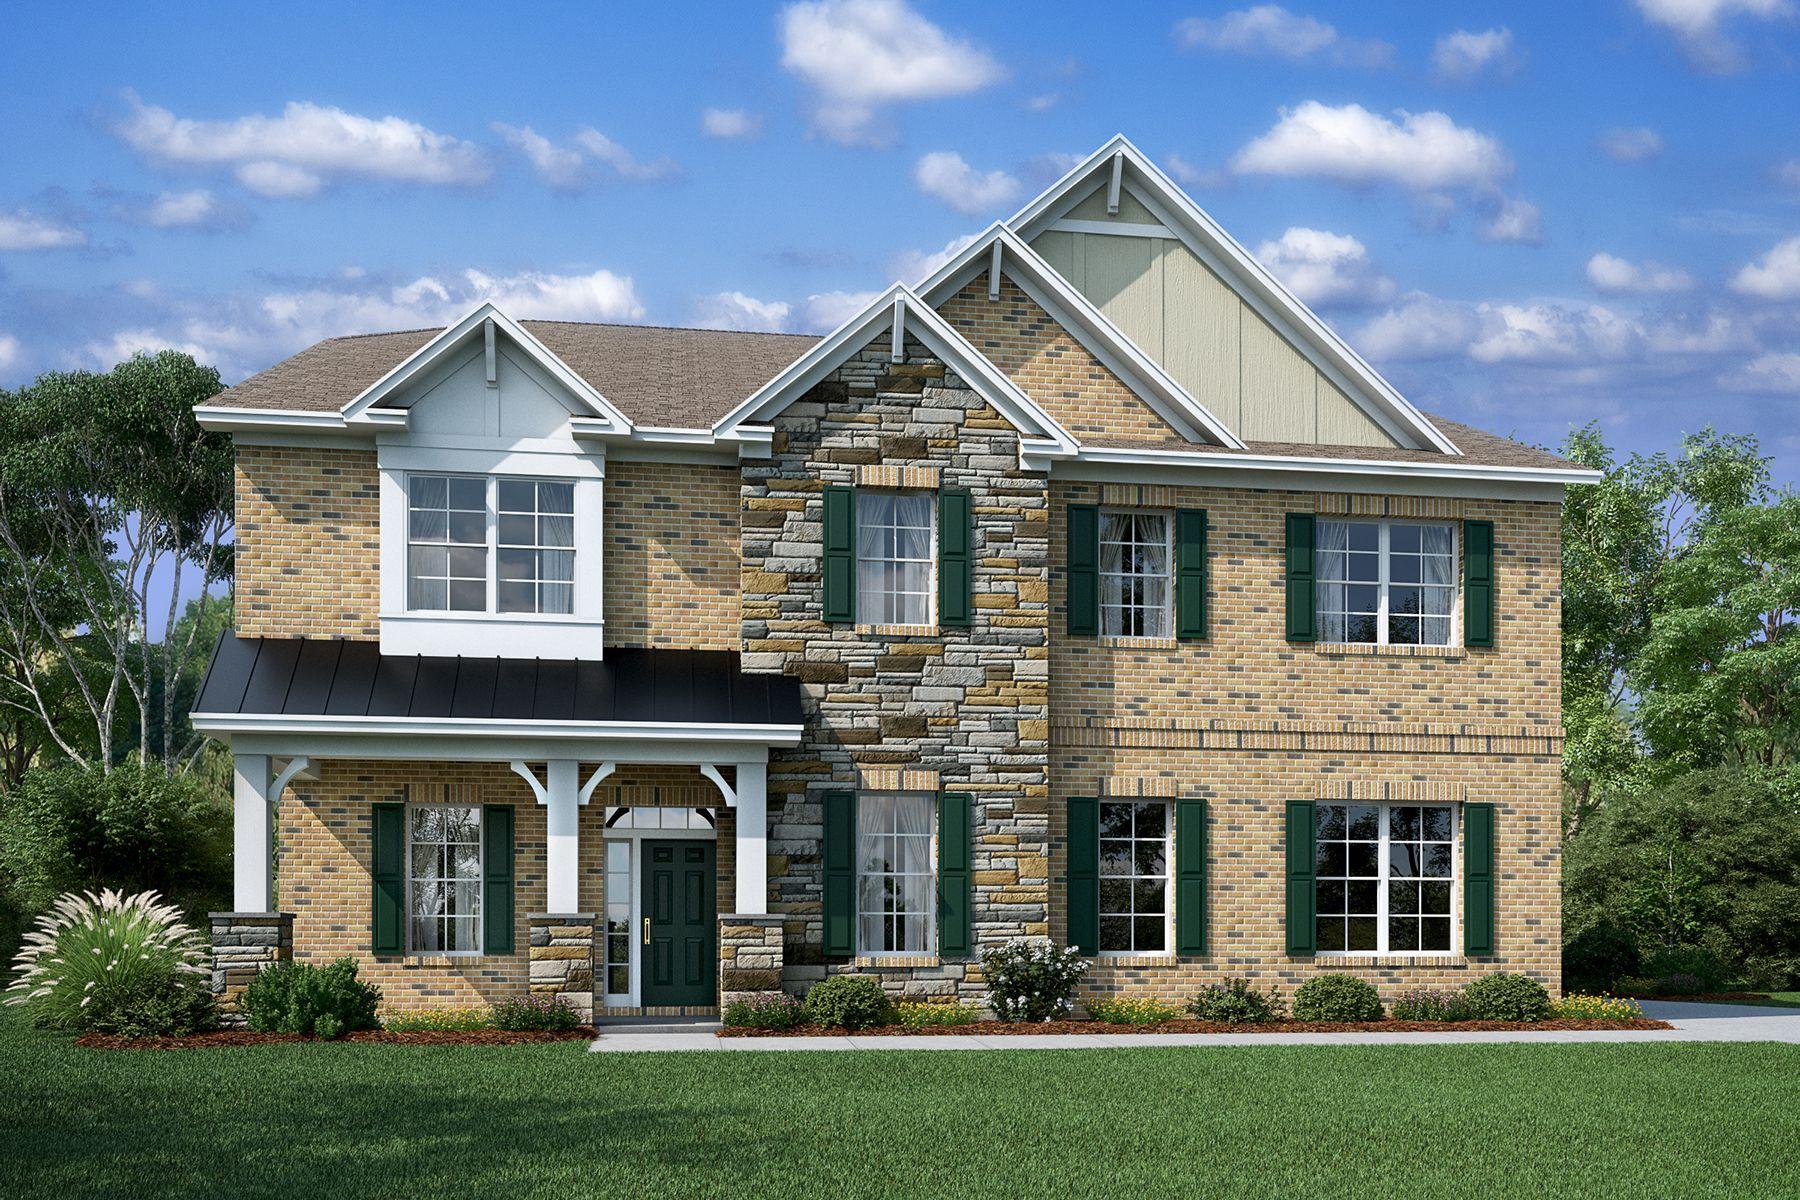 Single Family for Sale at Blume - Sutton 2507 Carnation Drive Harrisburg, North Carolina 28075 United States